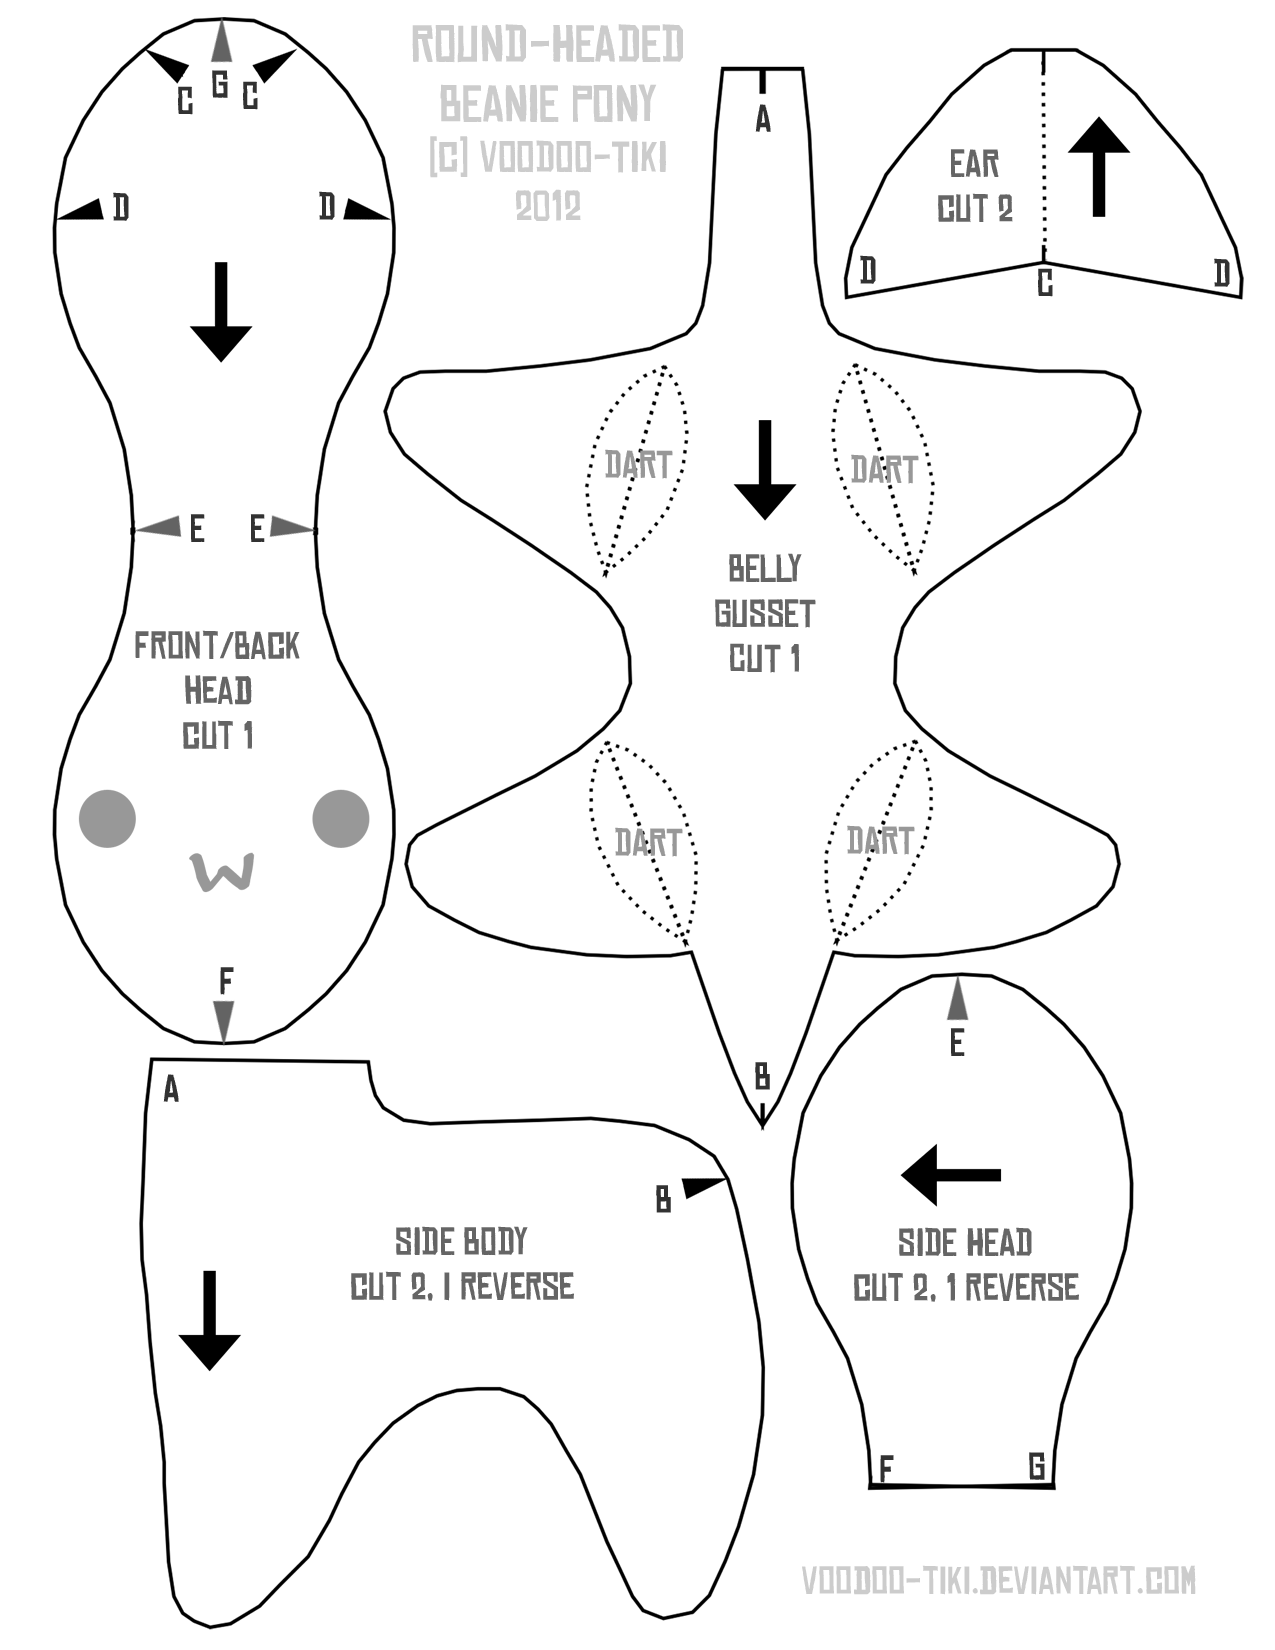 Round Head Beanie Pony Pattern By Voodoo Tiki On Plushie